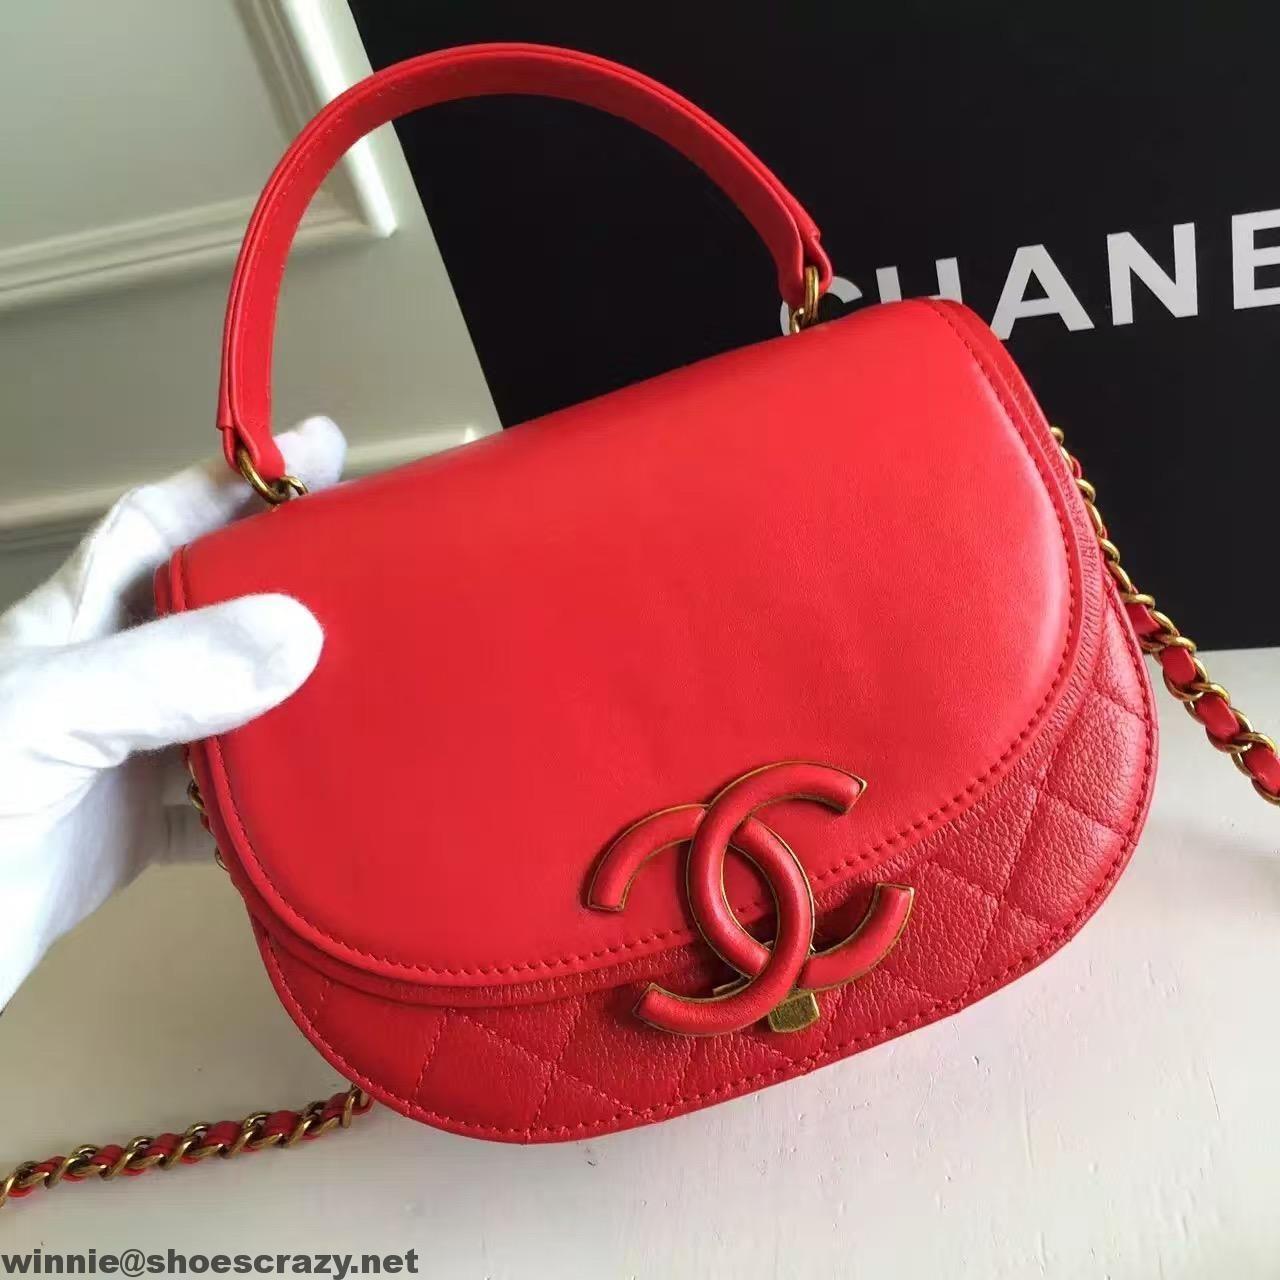 ada265fc35fd Chanel Coco Curve Flap Messenger Bag A93460 Paris 2016 | Chanel ...